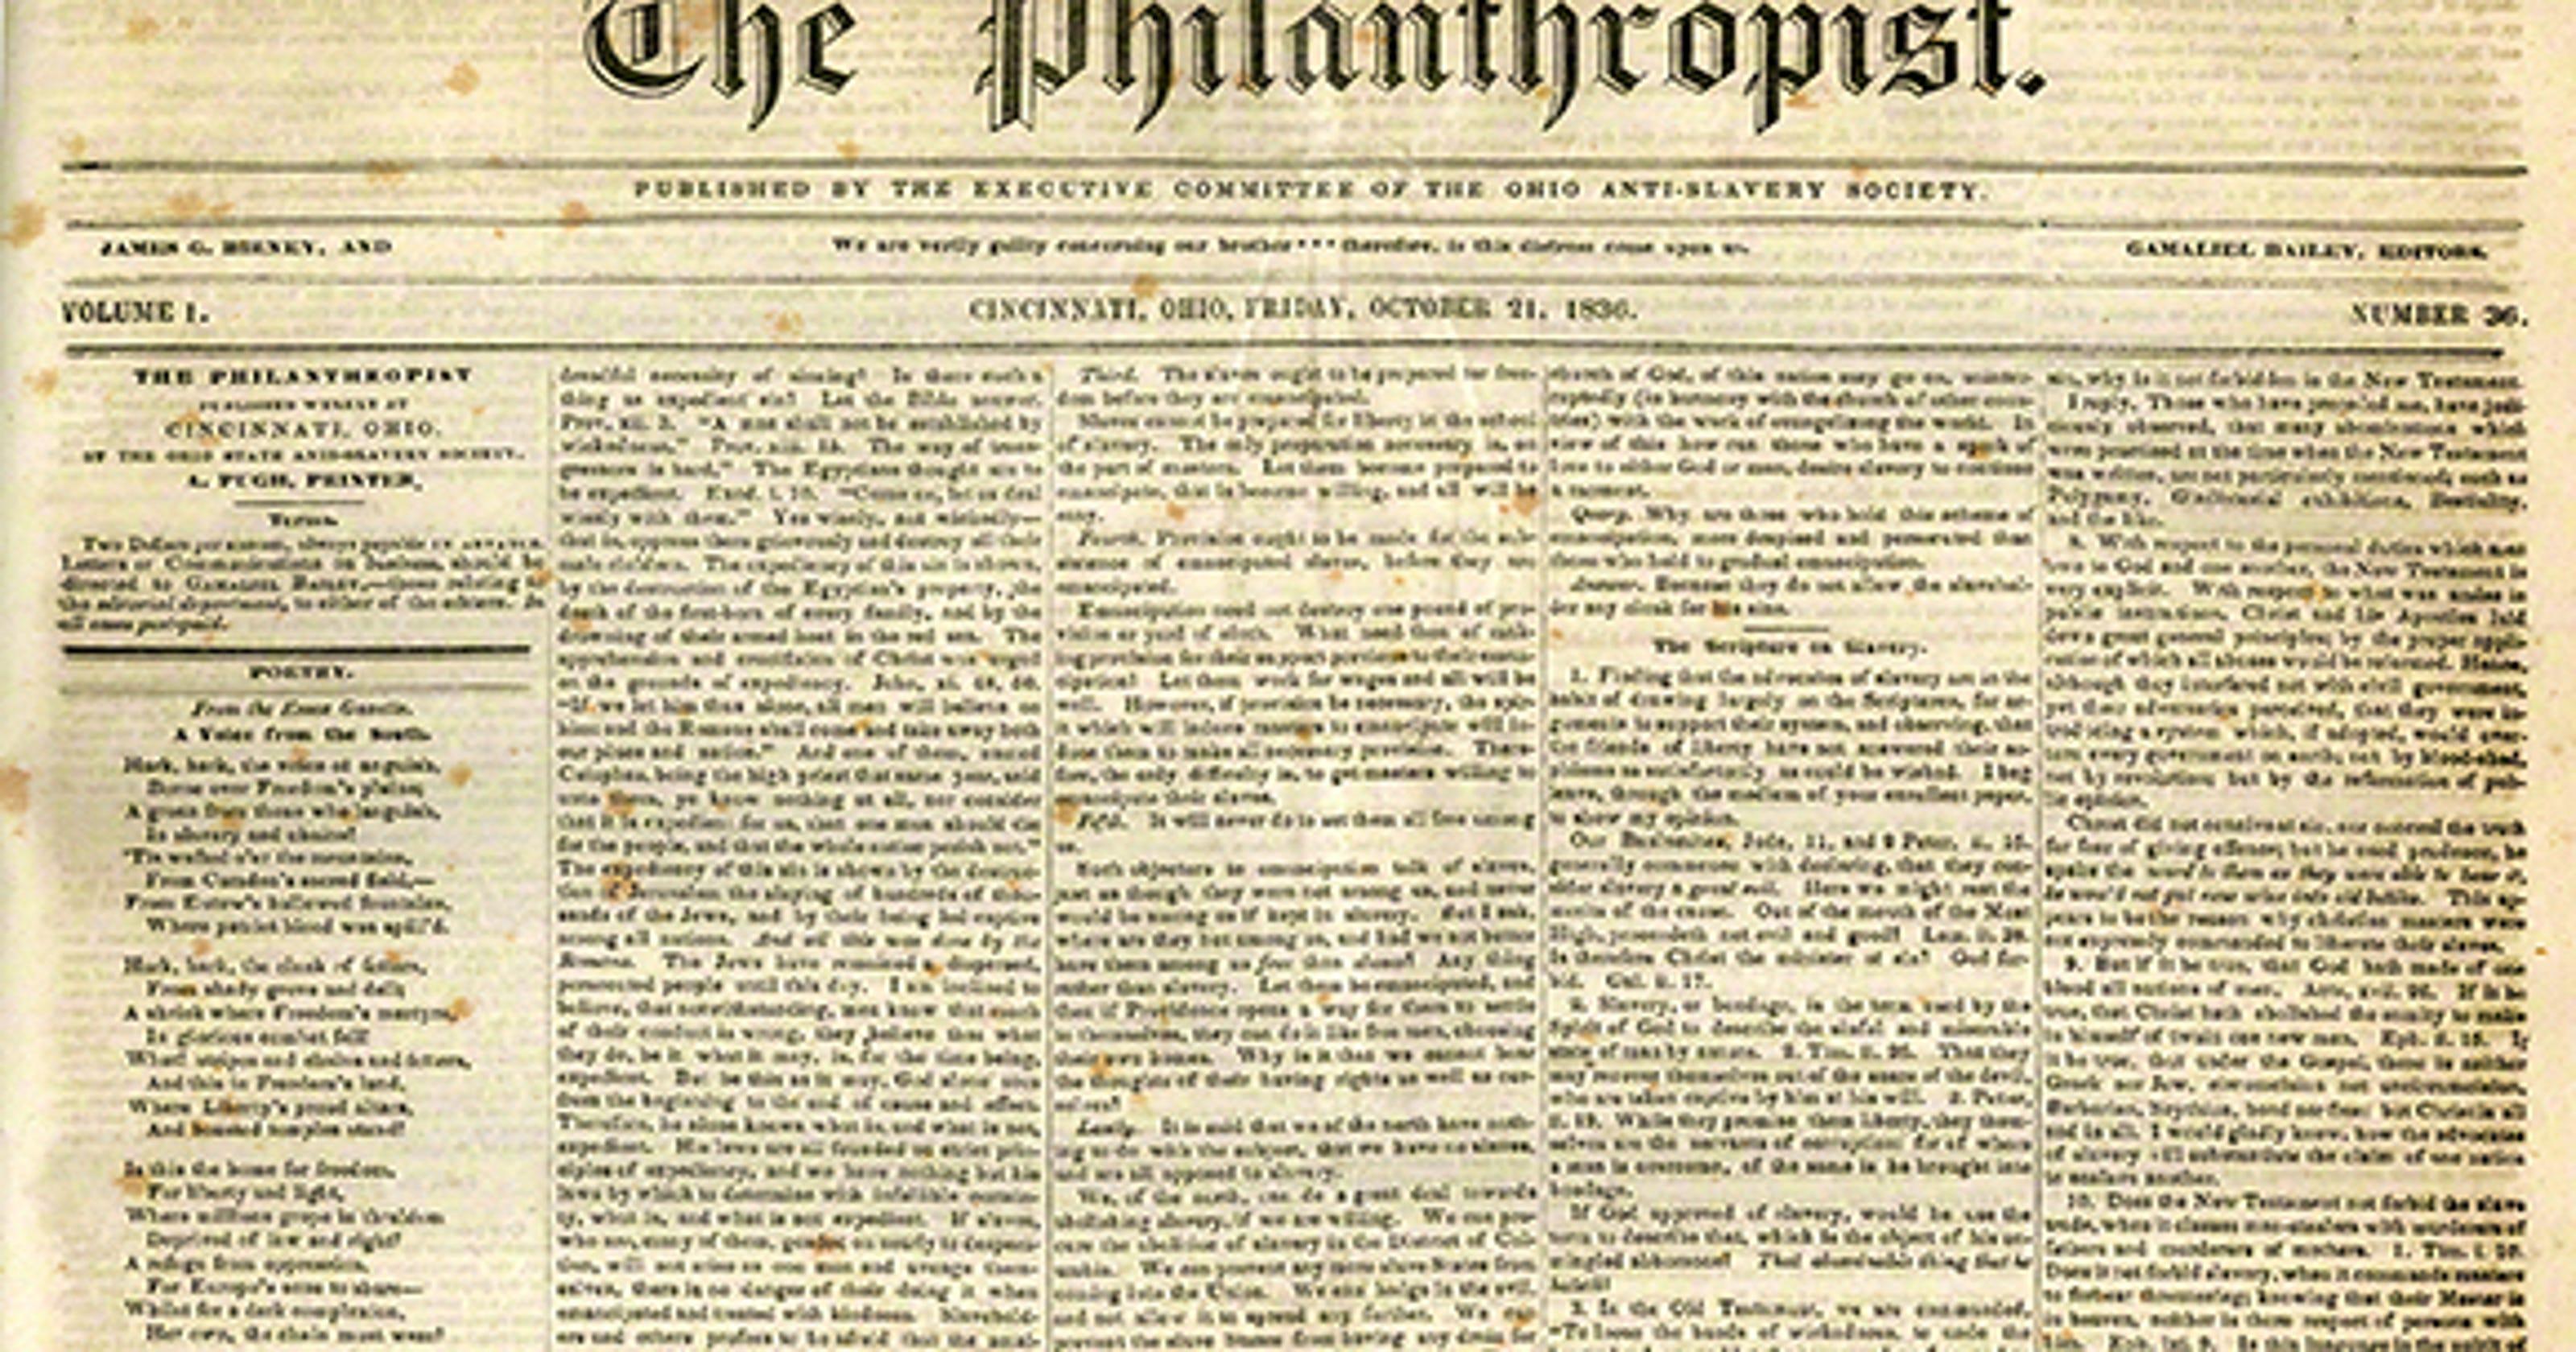 Cincinnati riots of 1836